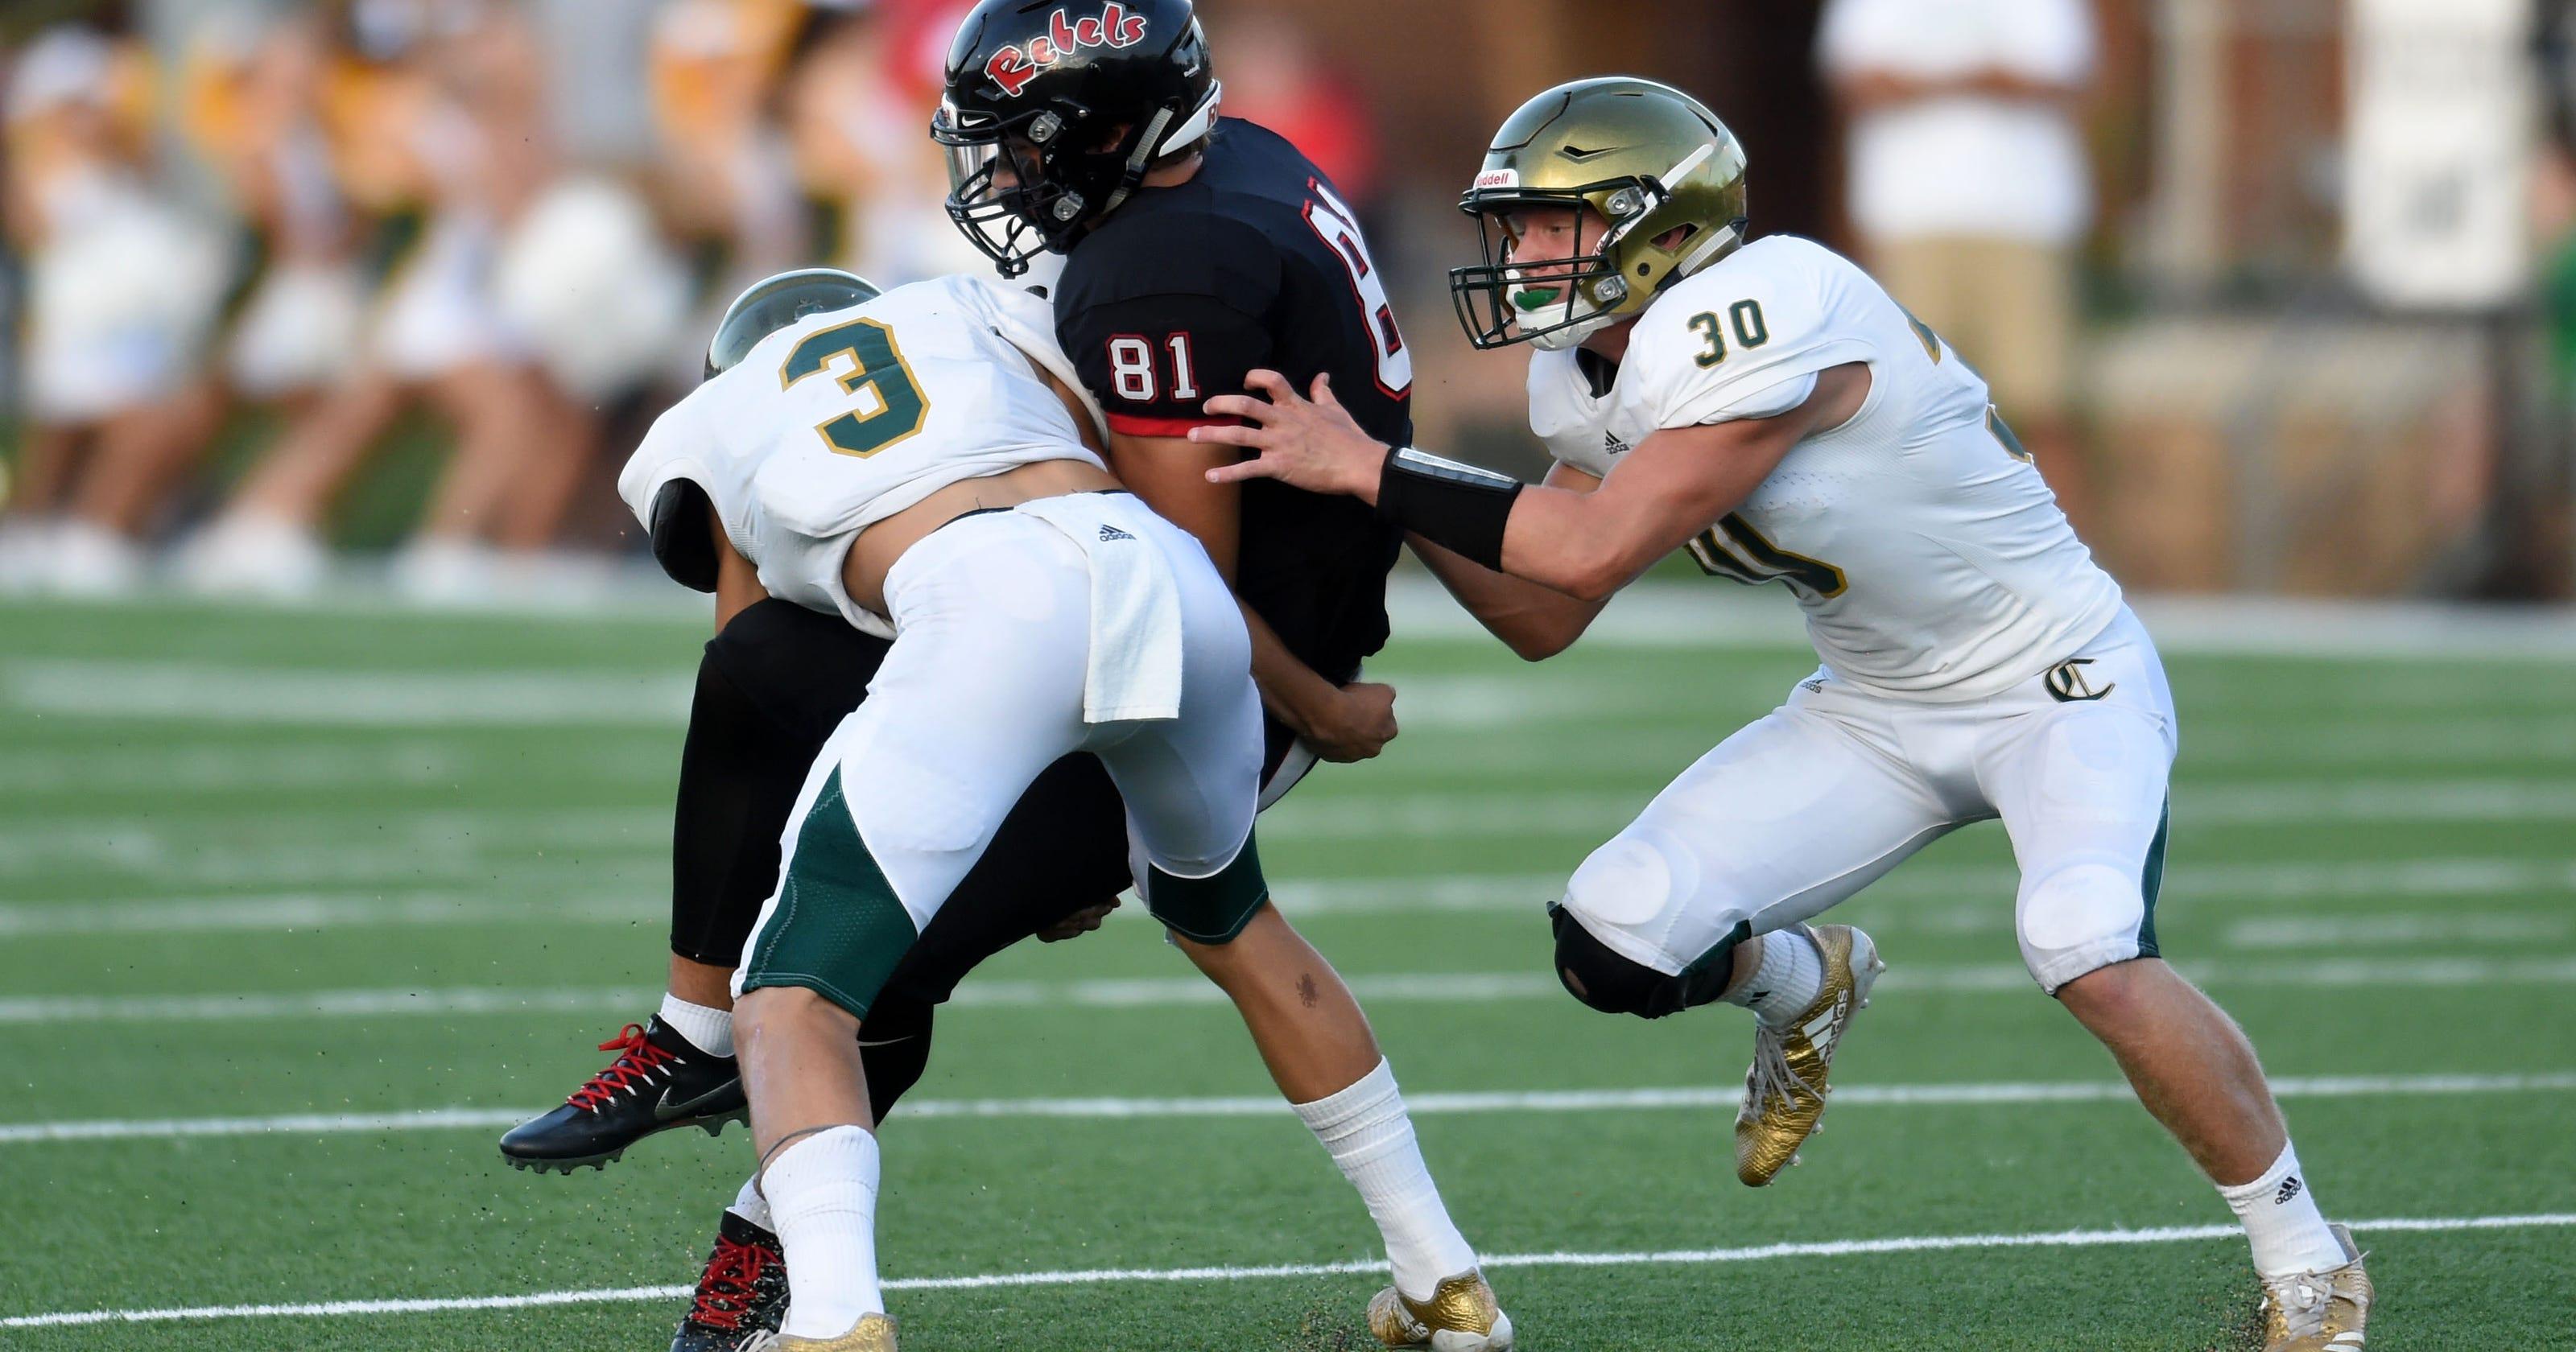 Knoxville football: Top TSSAA high school games for Week 1